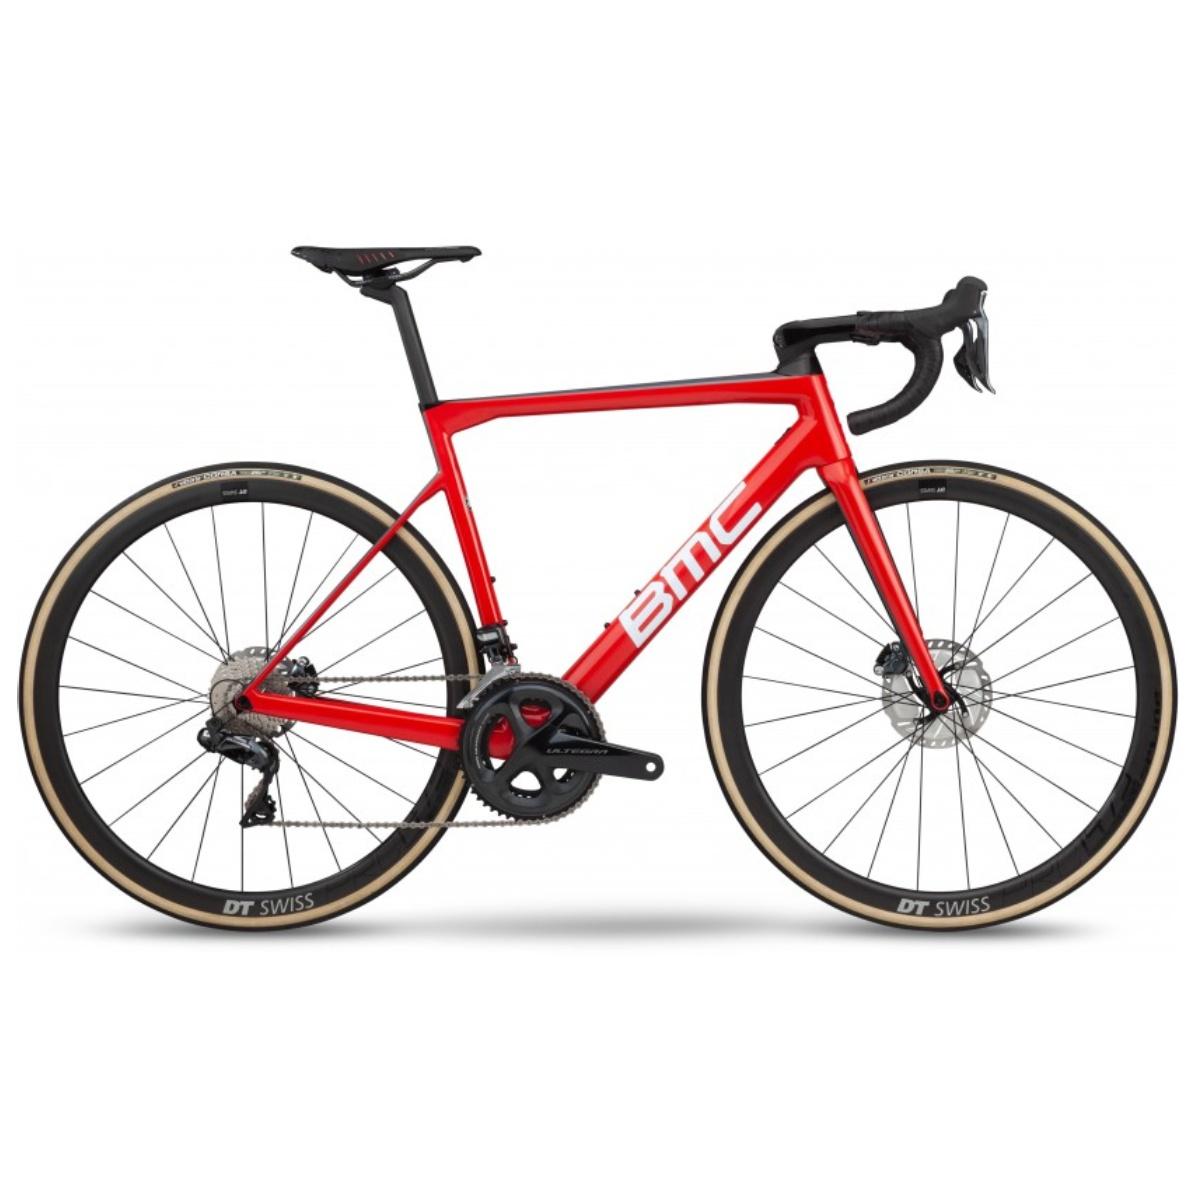 bmc-teammachine-slr01-three-disc-red-white-carbon-54-301437